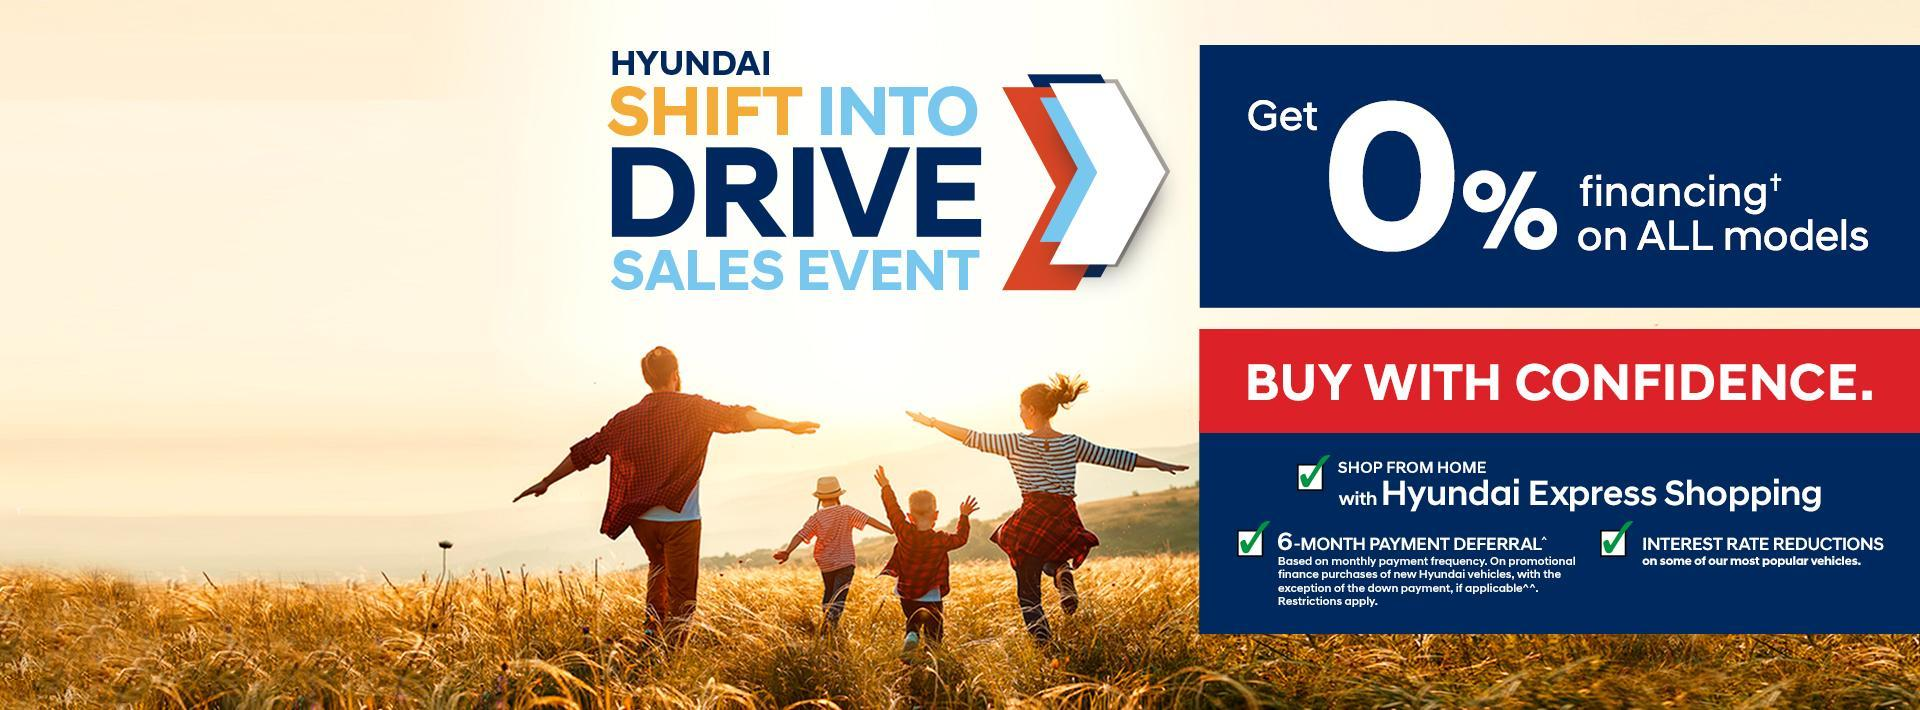 Shift into Drive Sales Event